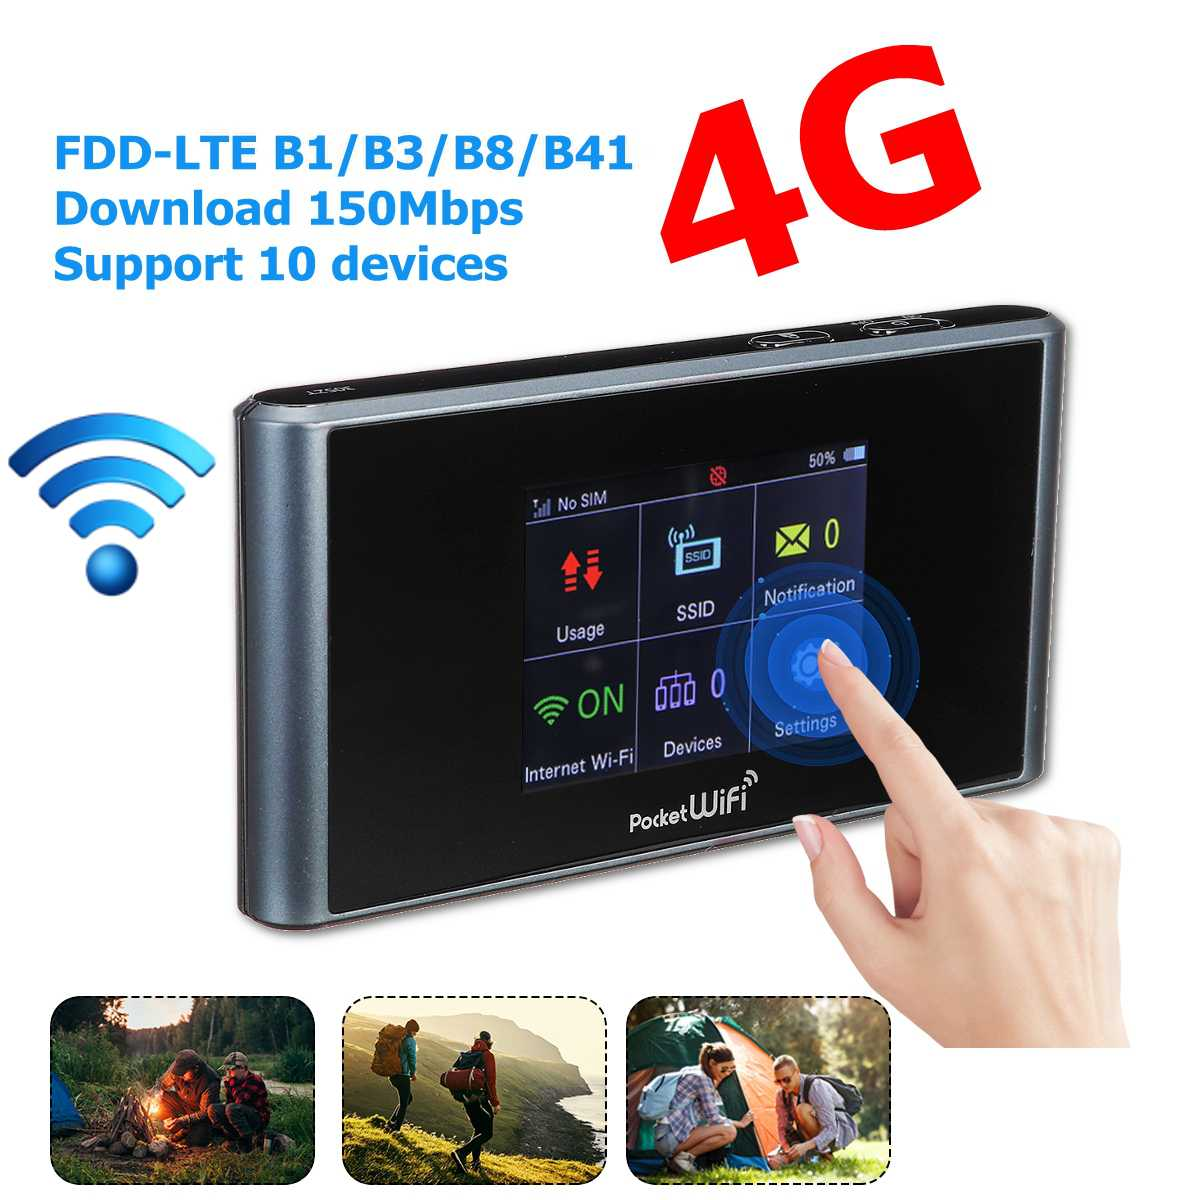 Enrutador Wifi Lte 4g portátil Hotspot Router inalámbrico compatible con tarjeta SIM módem de 150Mbps para la oficina en casa